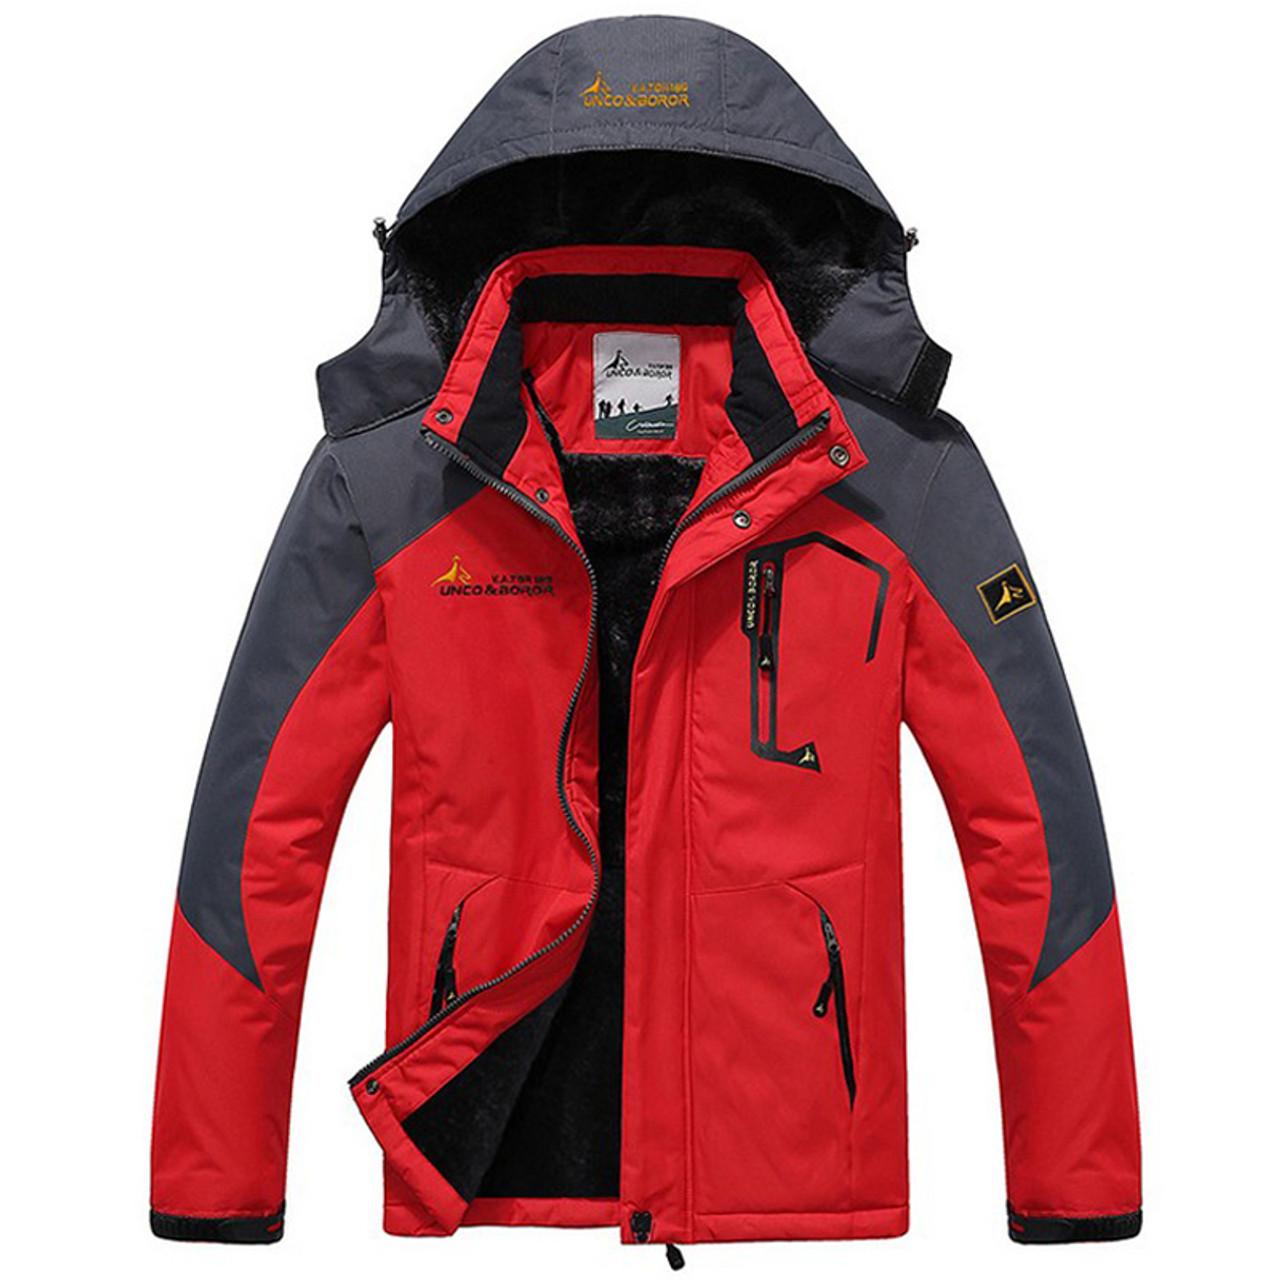 b81e2e9c980 New Winter Jacket Men Thick Velvet Warm Coat Thermal Warm Windproof Hood  Jackets Mens Outwear Parka Homme Jaqueta Casual Coats